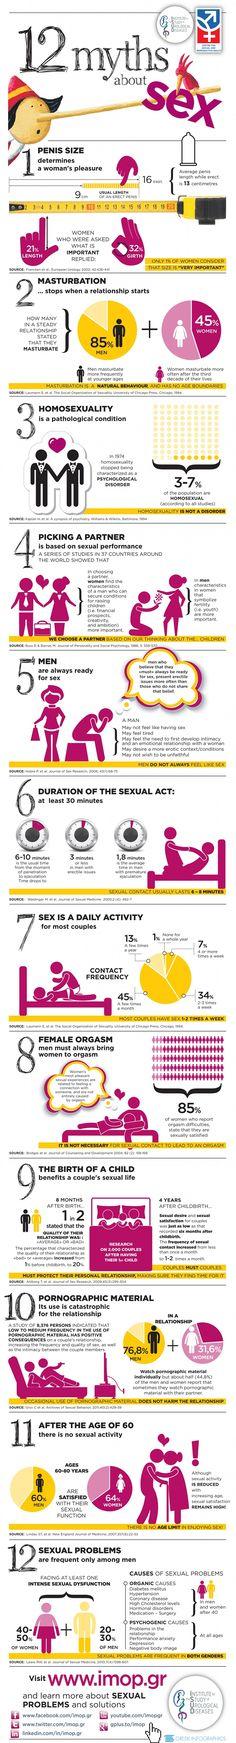 12-myths-about-sex